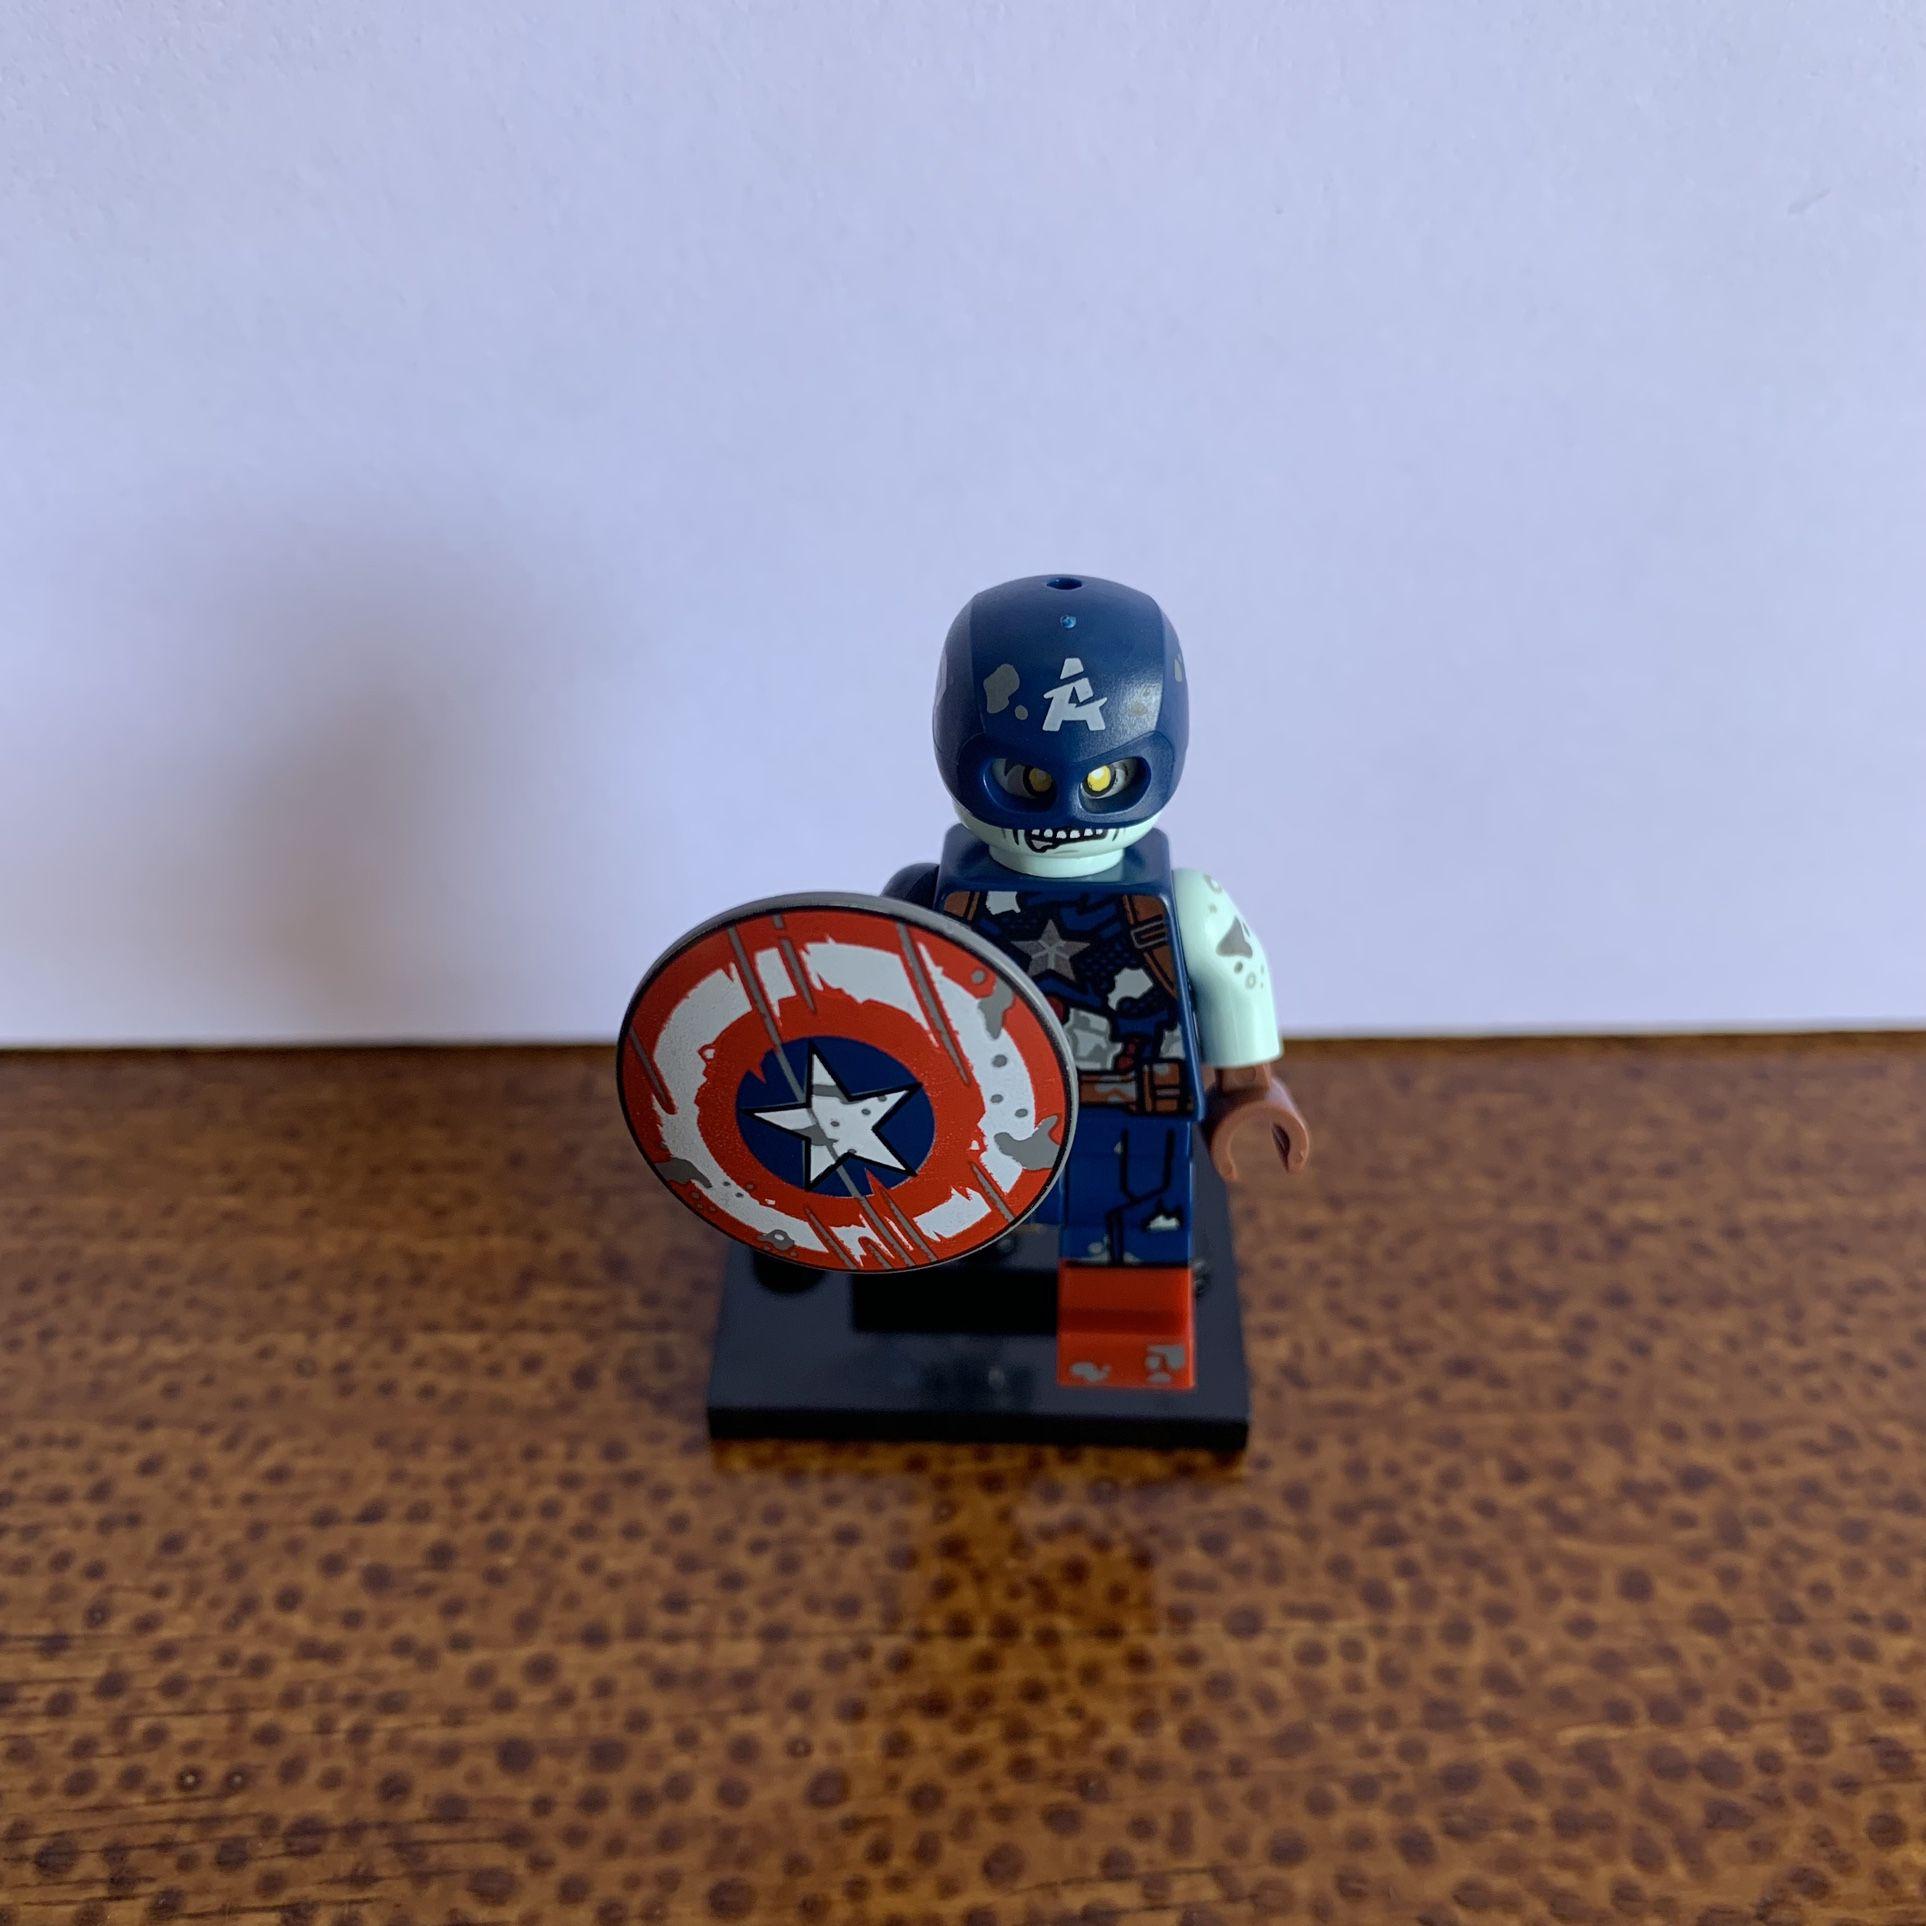 LEGO 2021 Marvel Studios Minifigures - Zombie Captain America (Steve Rogers)